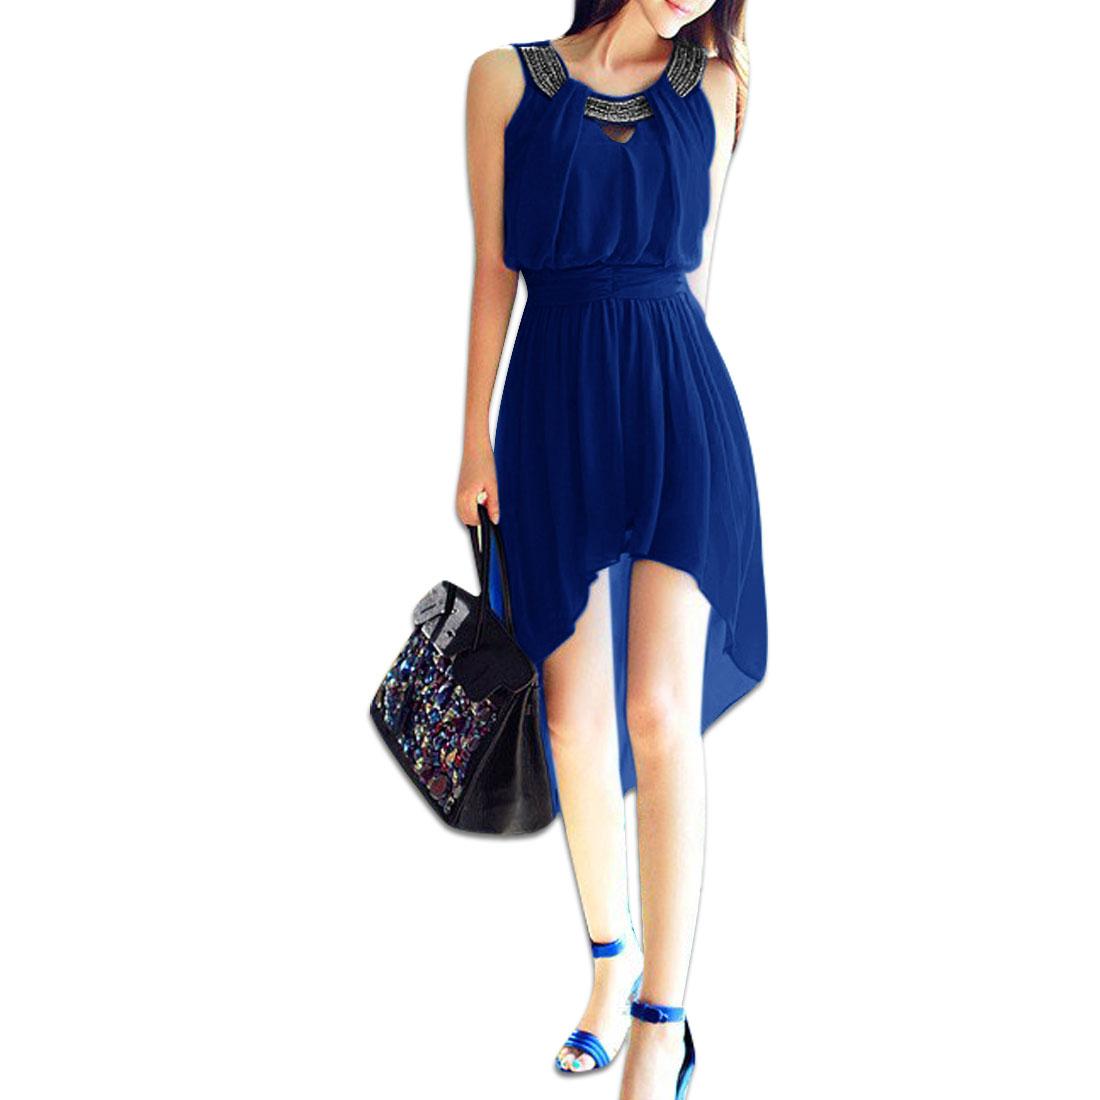 Woman Metalic Chain Decor Round Neck Sleeveless Low-High Hem Royalblue Dress XS